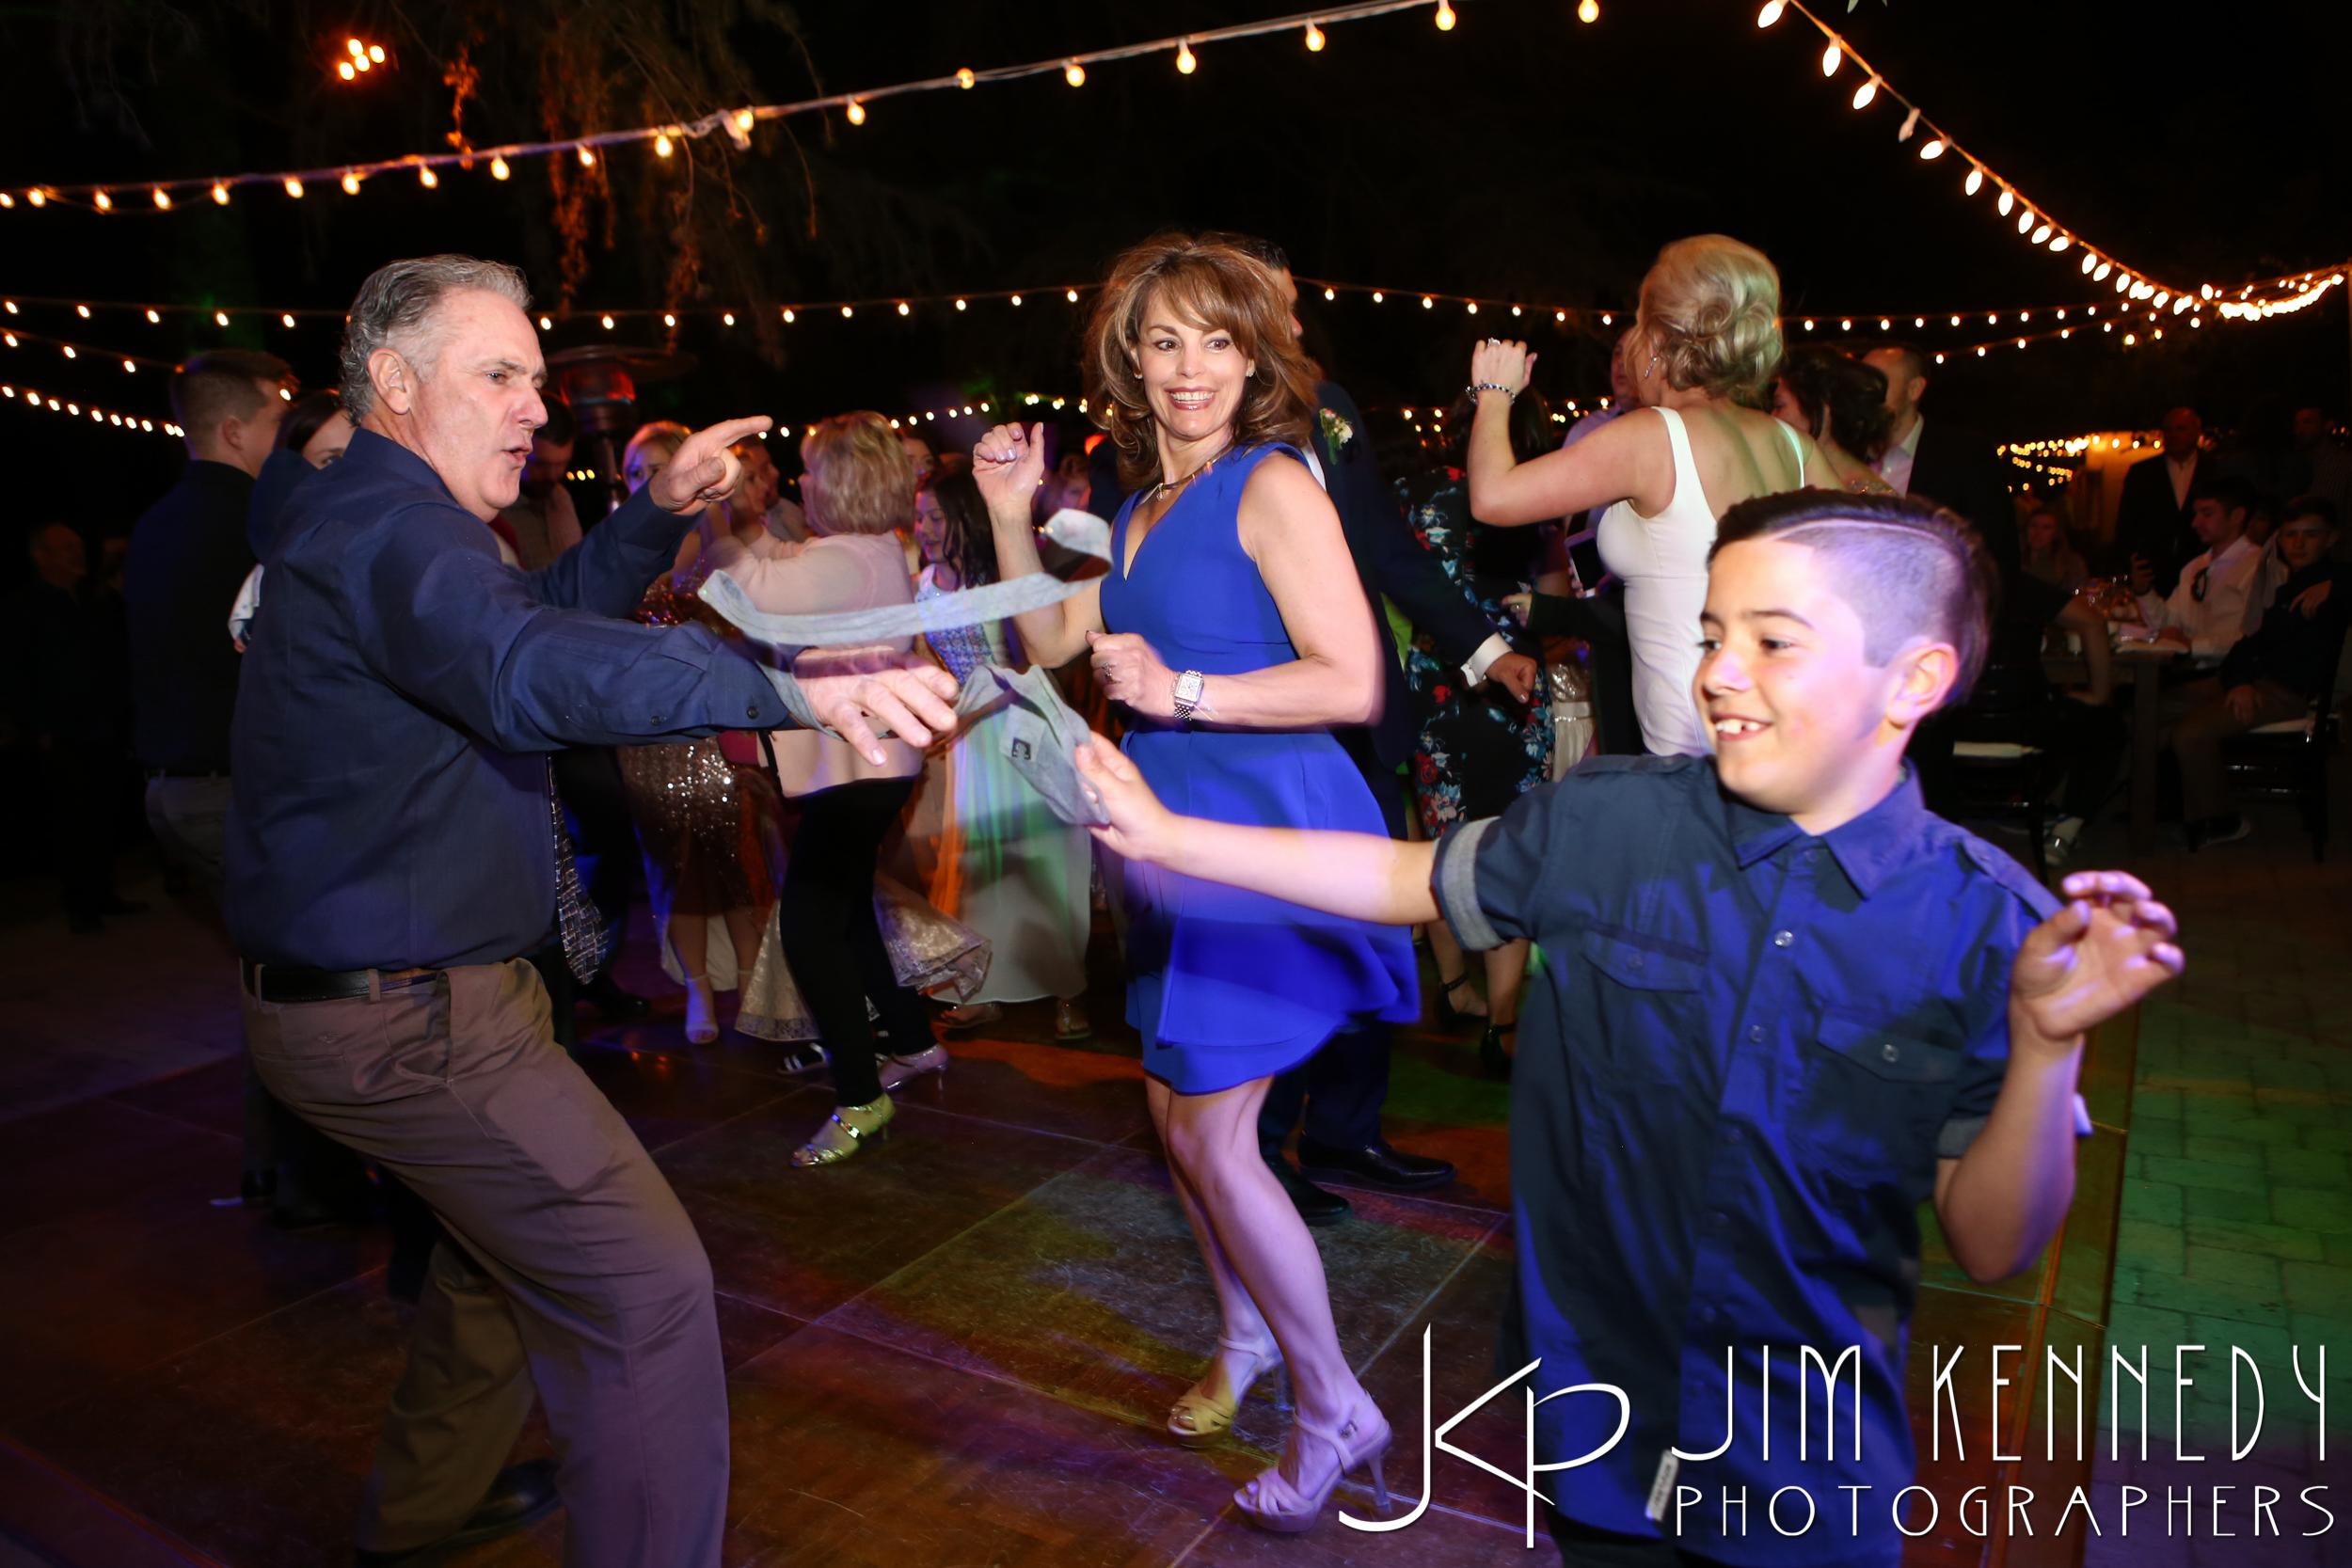 jim_kennedy_photographers_highland_springs_wedding_caitlyn_0203.jpg